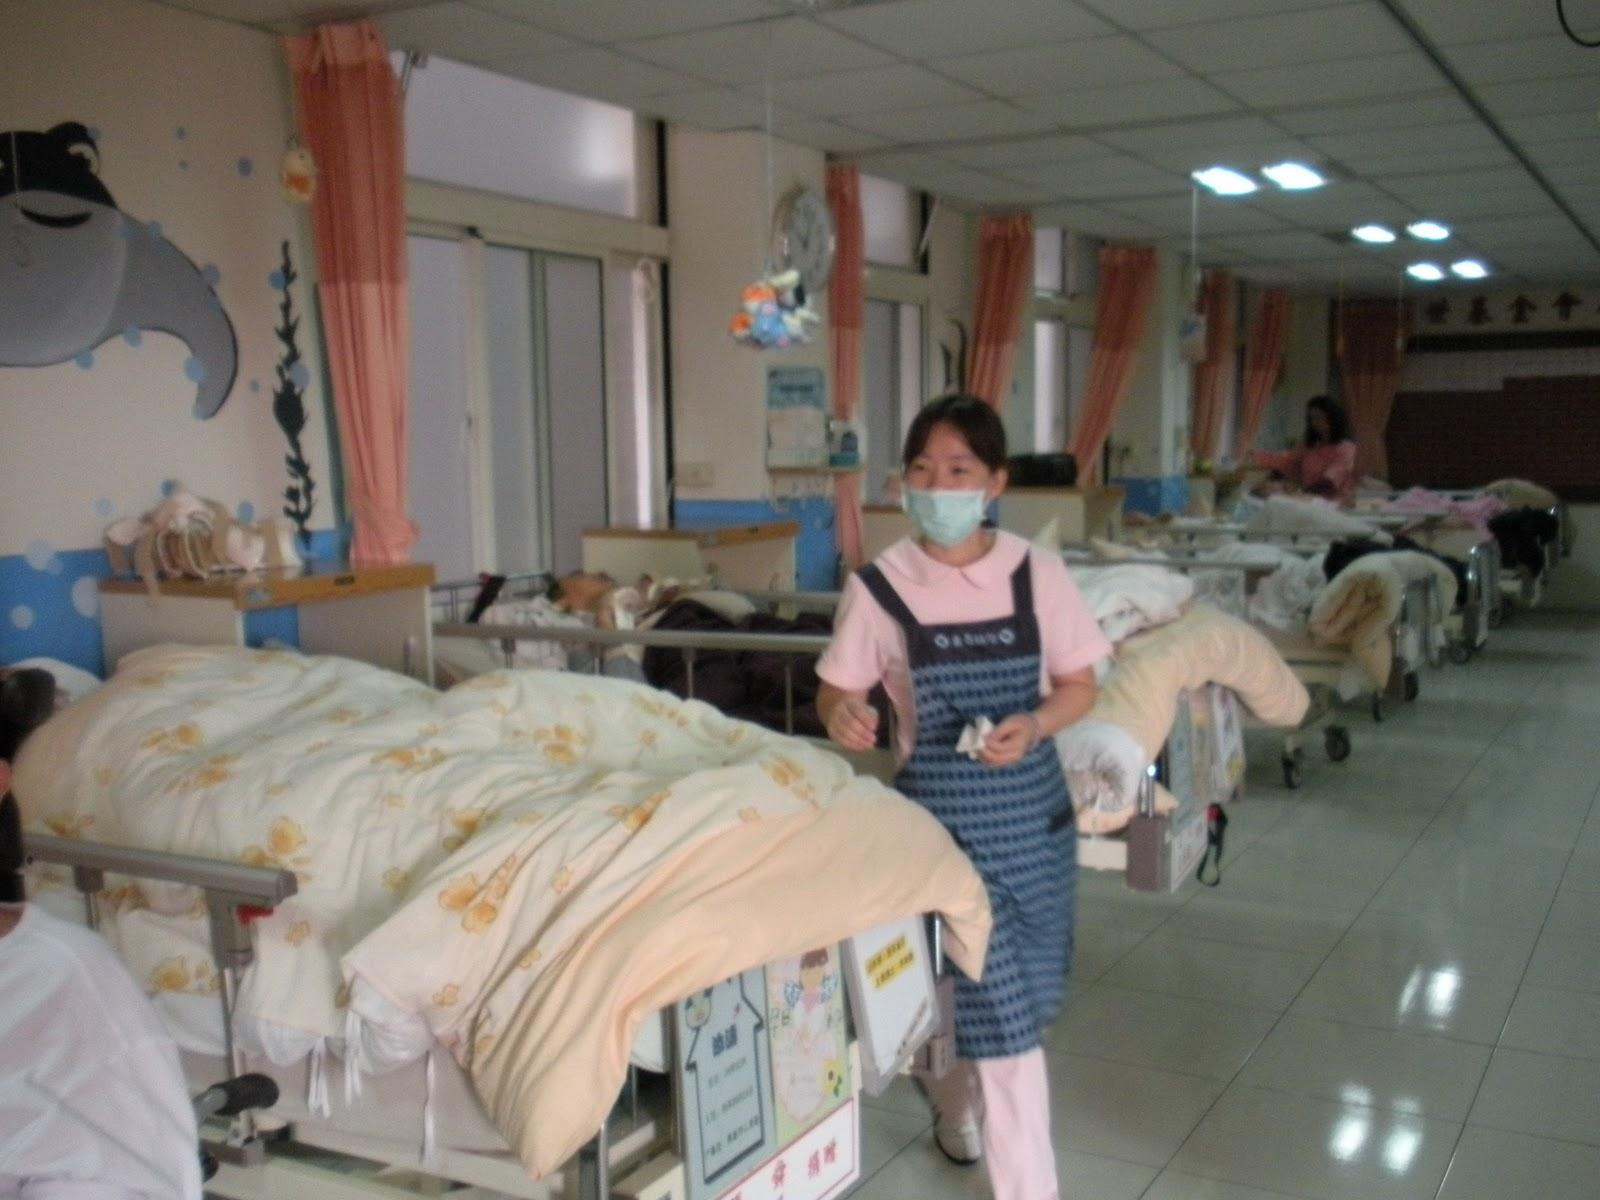 Taiwanese Adventurer Nursing Home Care In Taiwan